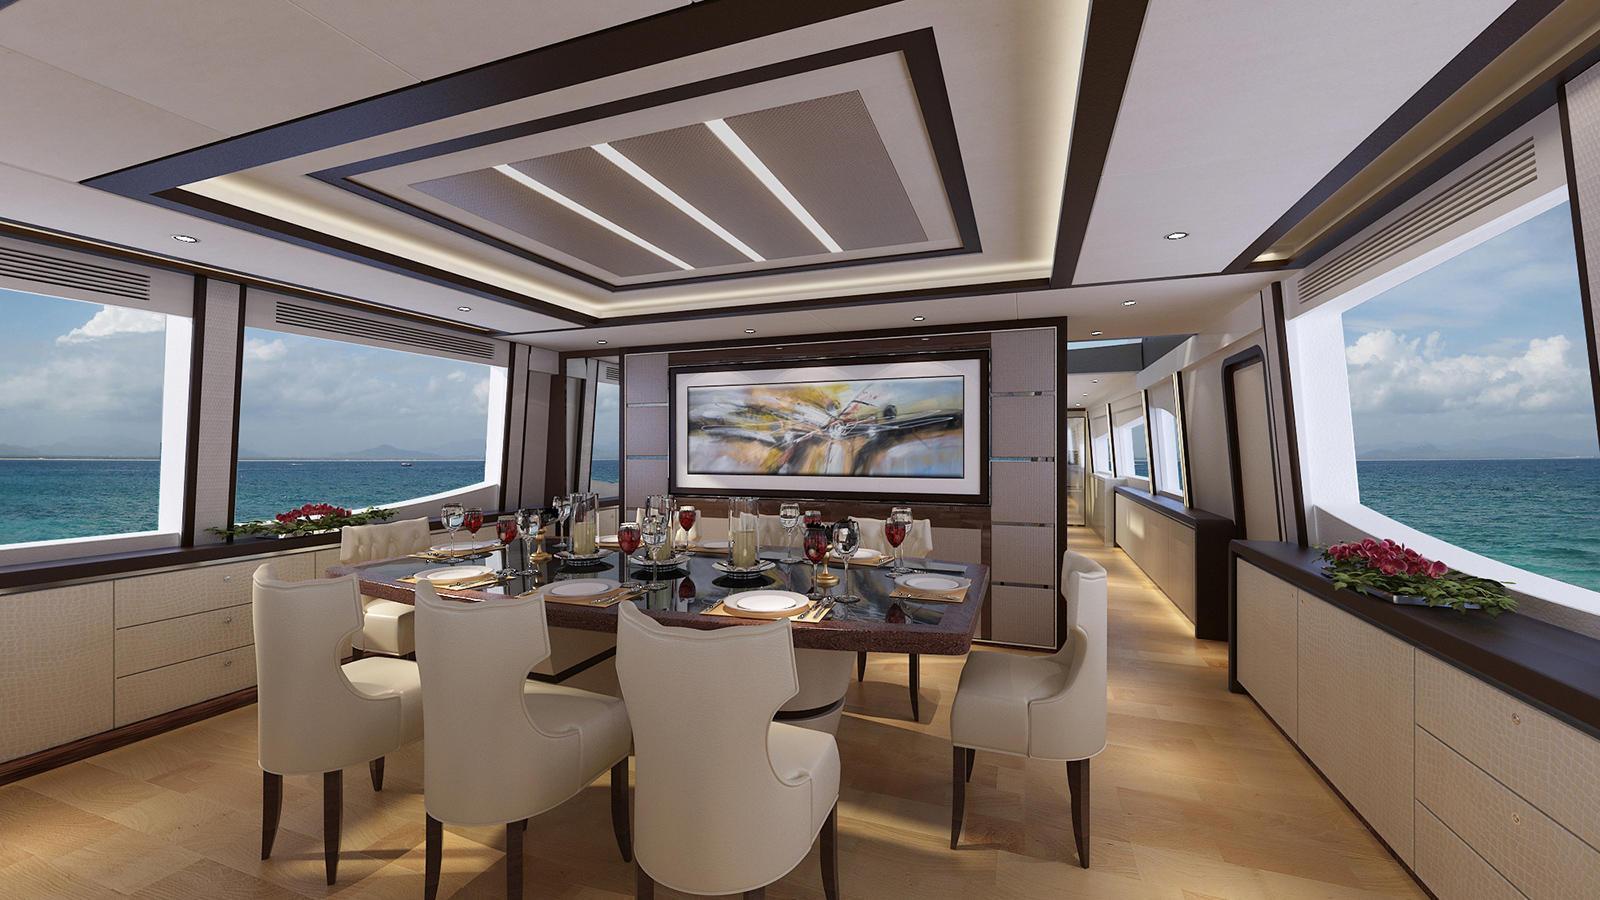 Asteria 108 motoryacht HeySea Yachts 33m 2020 dining area sistership